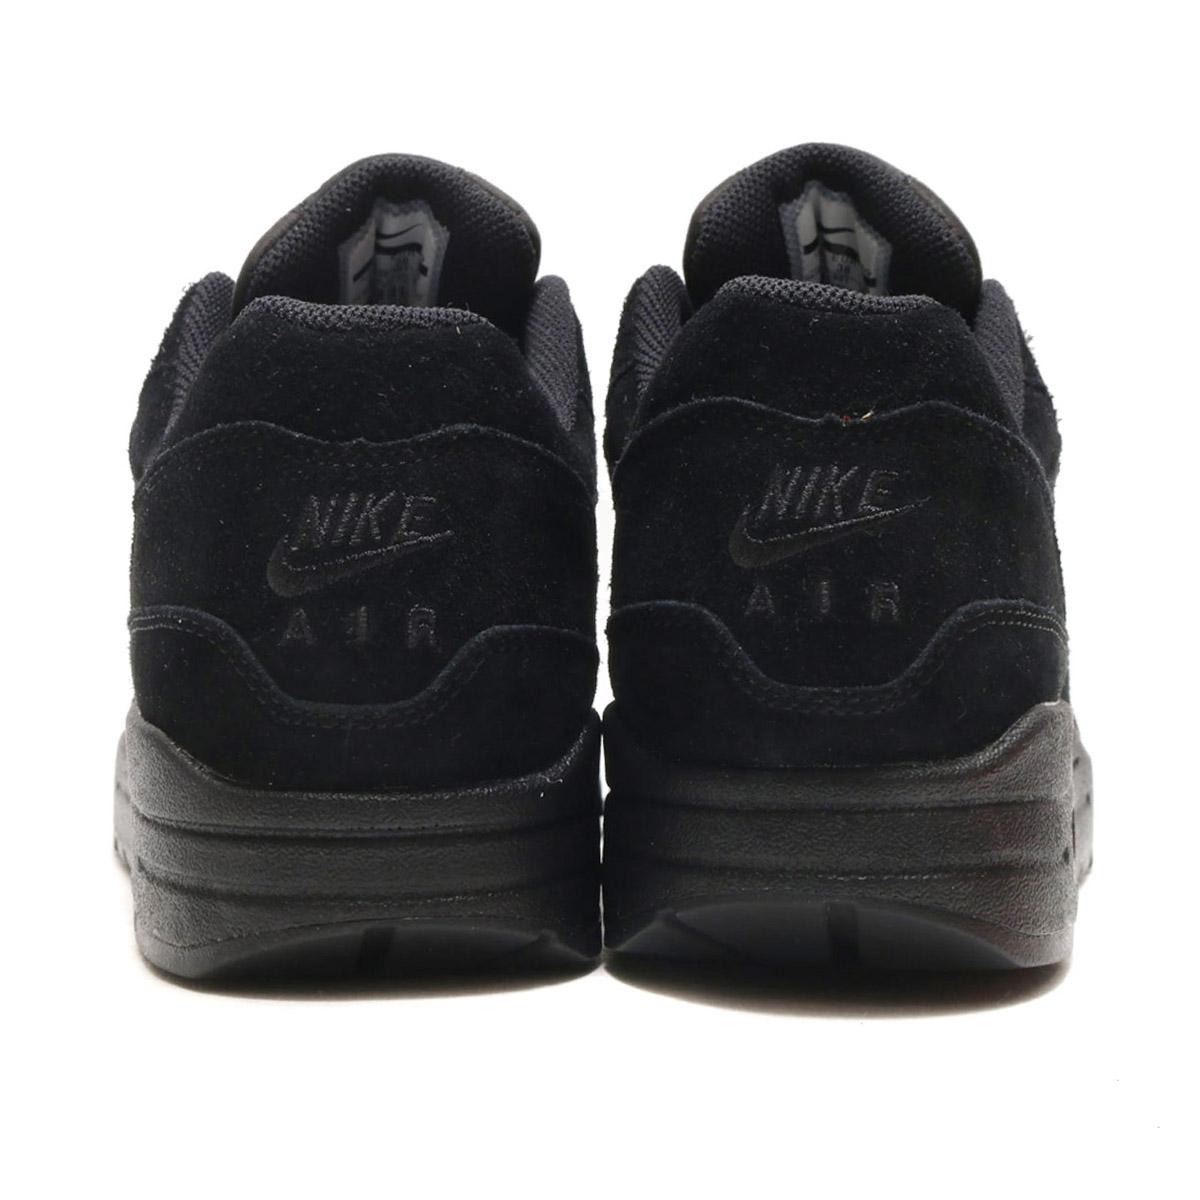 quality design 1bfde 88fcf NIKE W AIR MAX 1 PREMIUM SC (Nike women Air Max 1 premium SC) (BLACK METALLIC  SILVER-WOLF GREY) 17HO-S